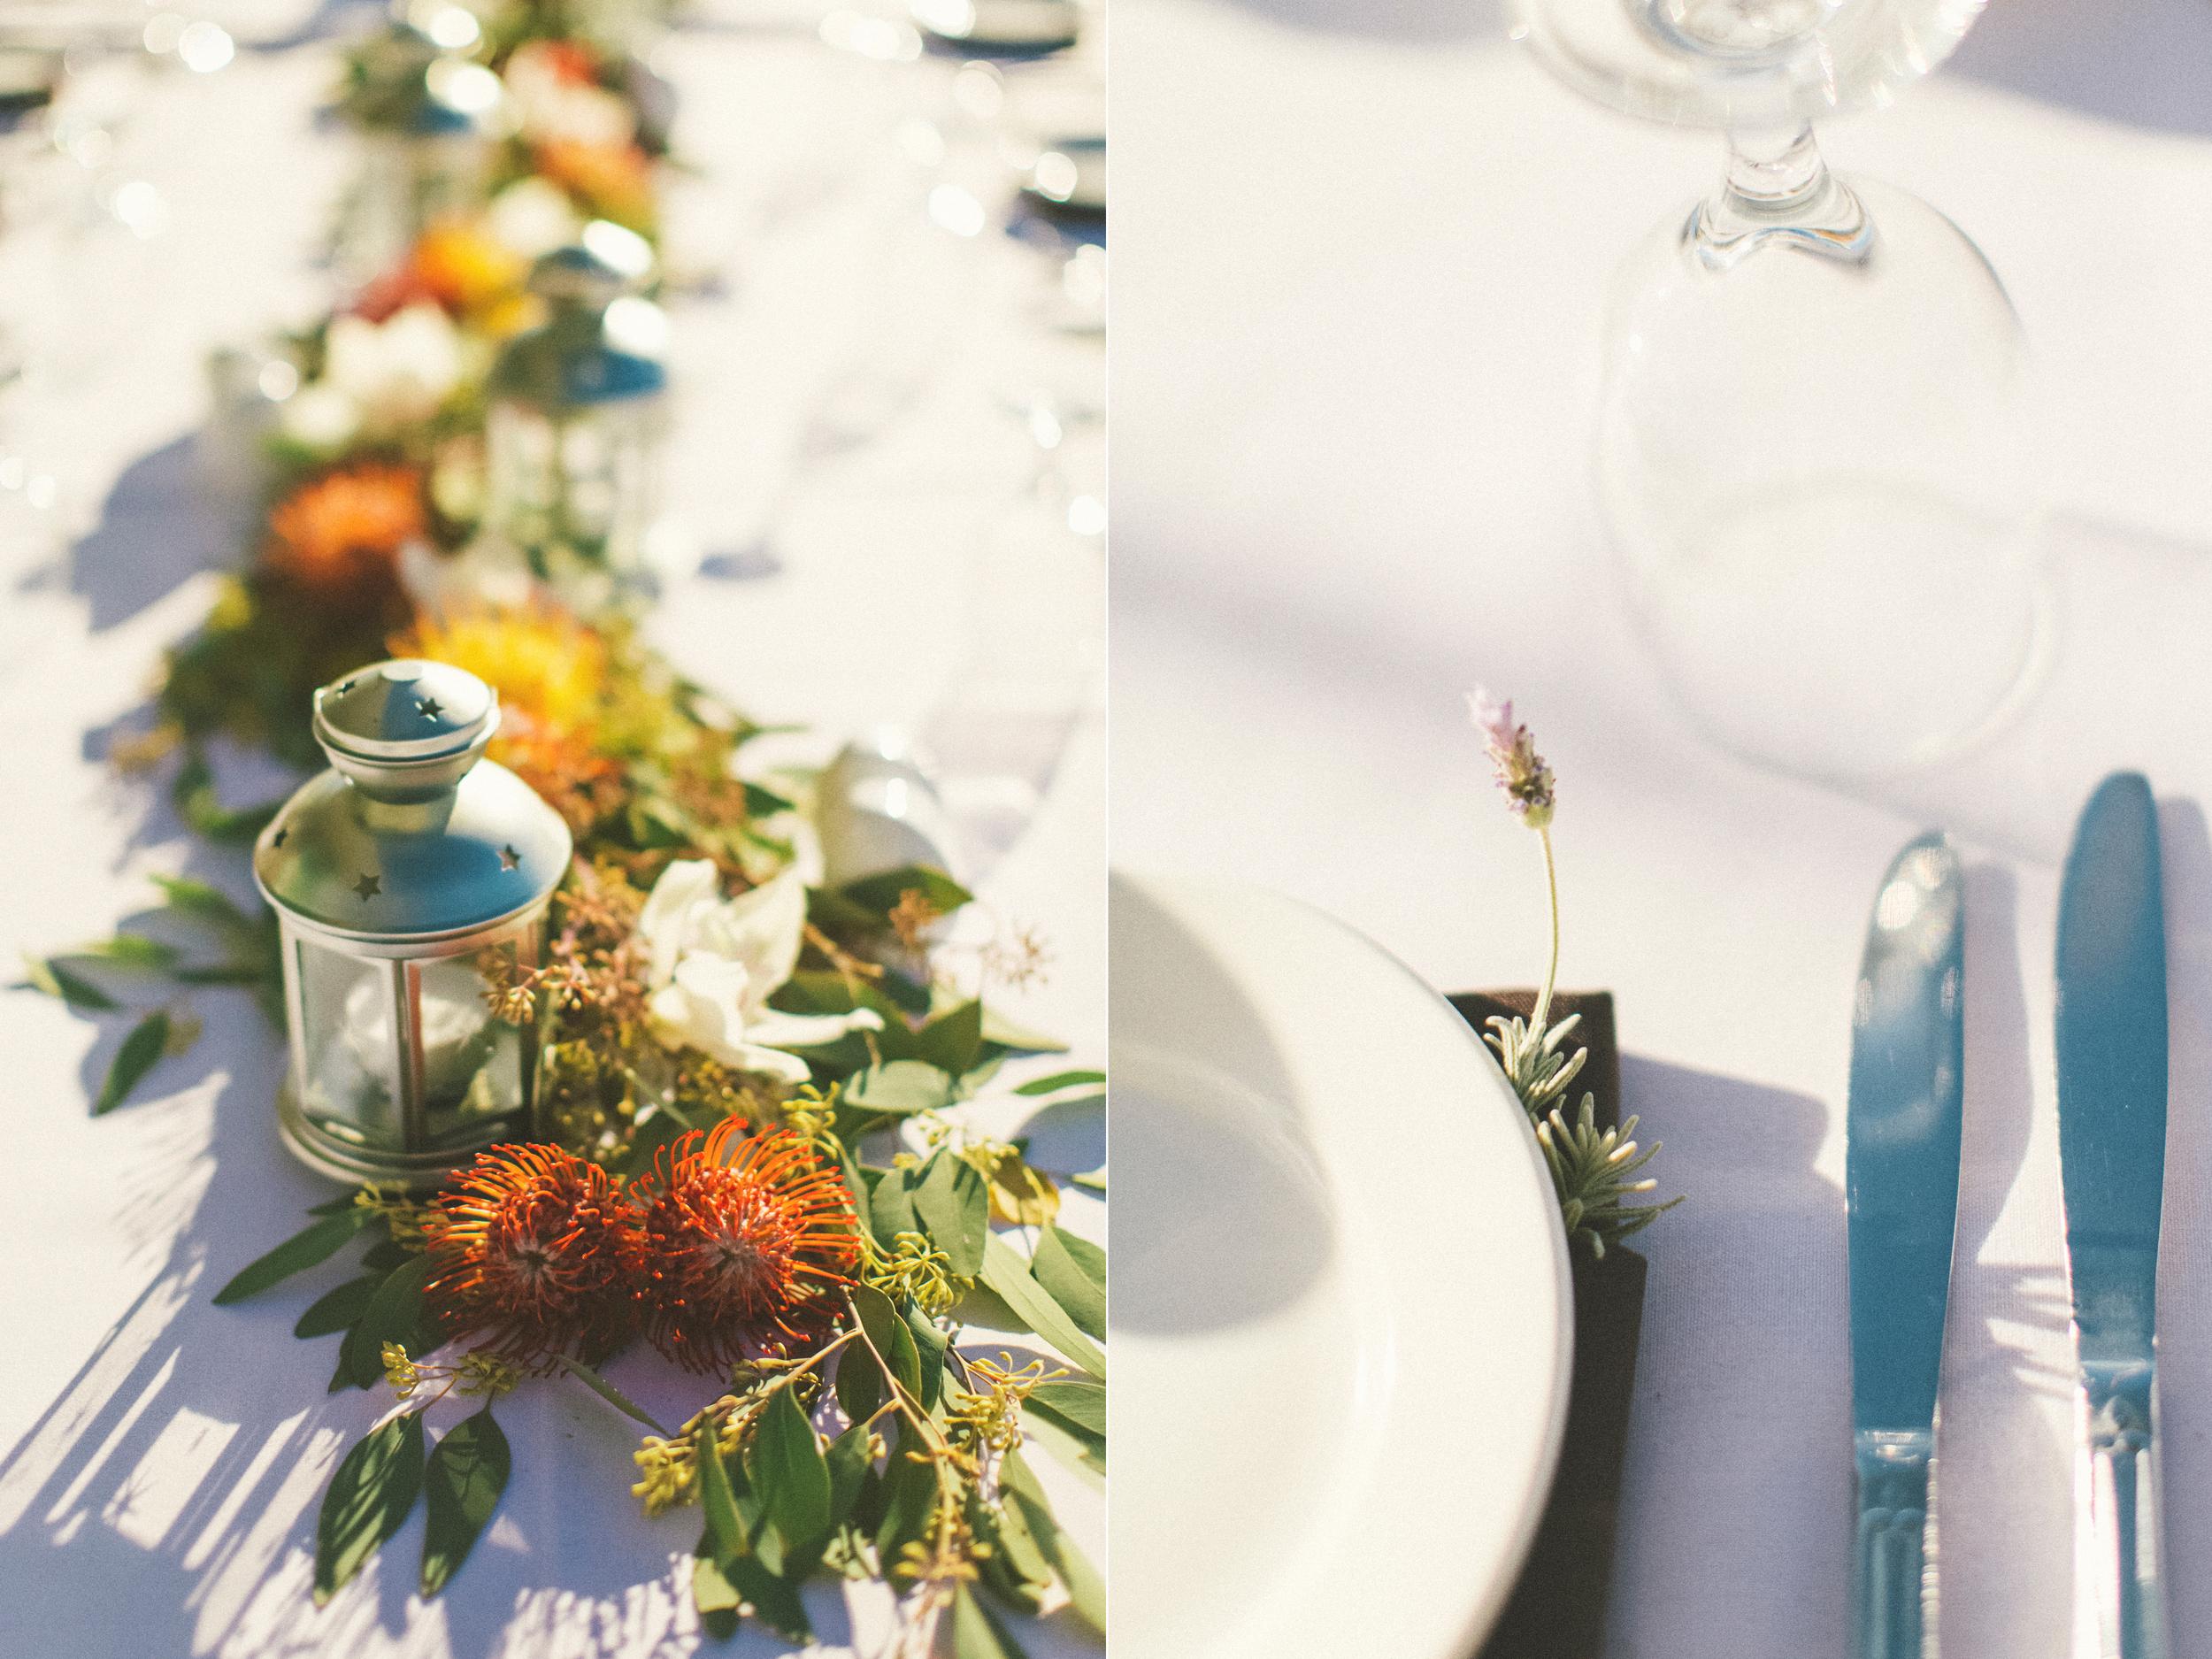 angie-diaz-photography-maui-wedding-90.jpg